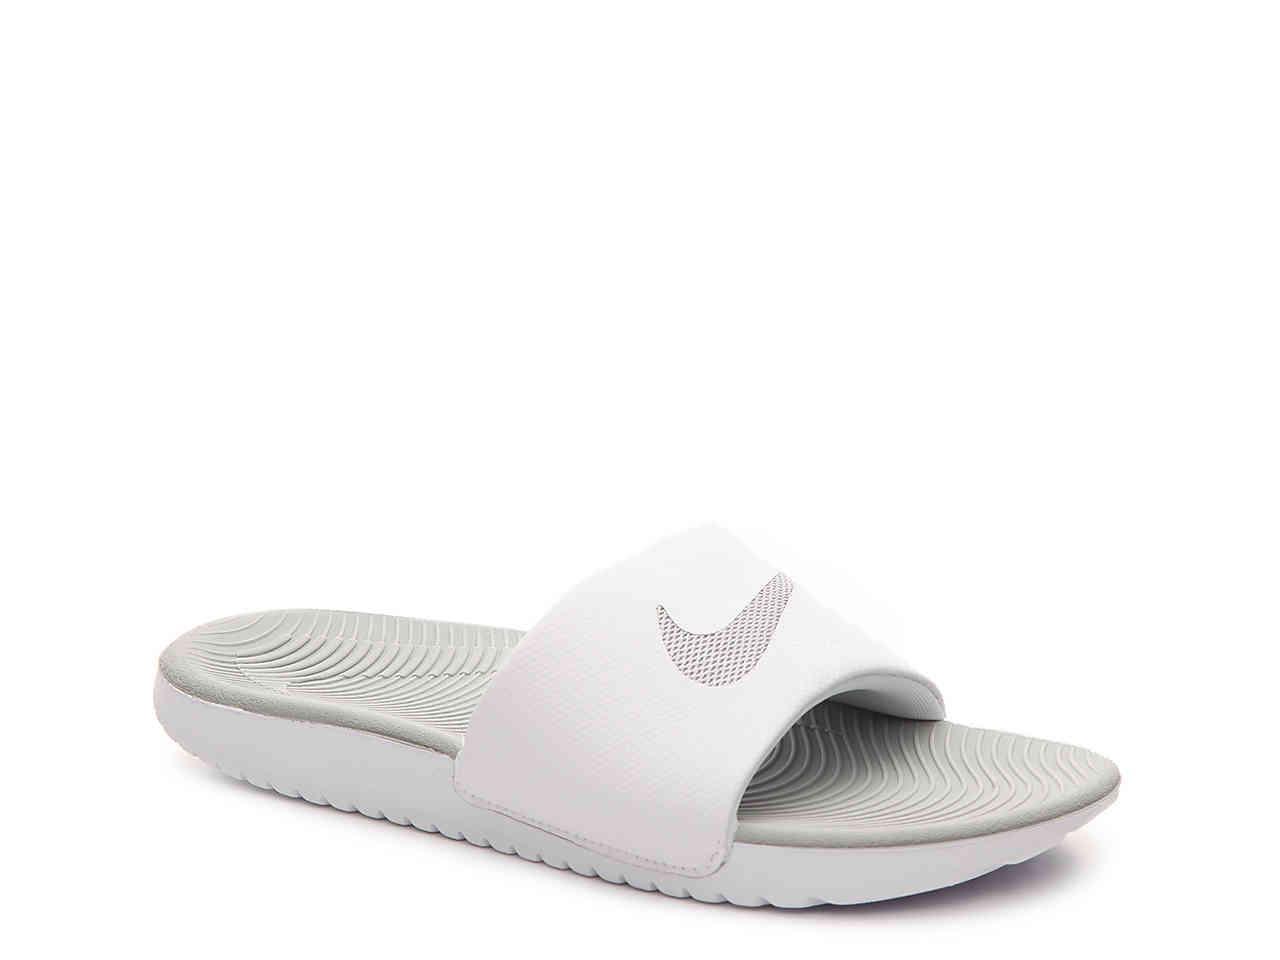 312b81e3c60443 Lyst - Nike Kawa Slide Sandal in White